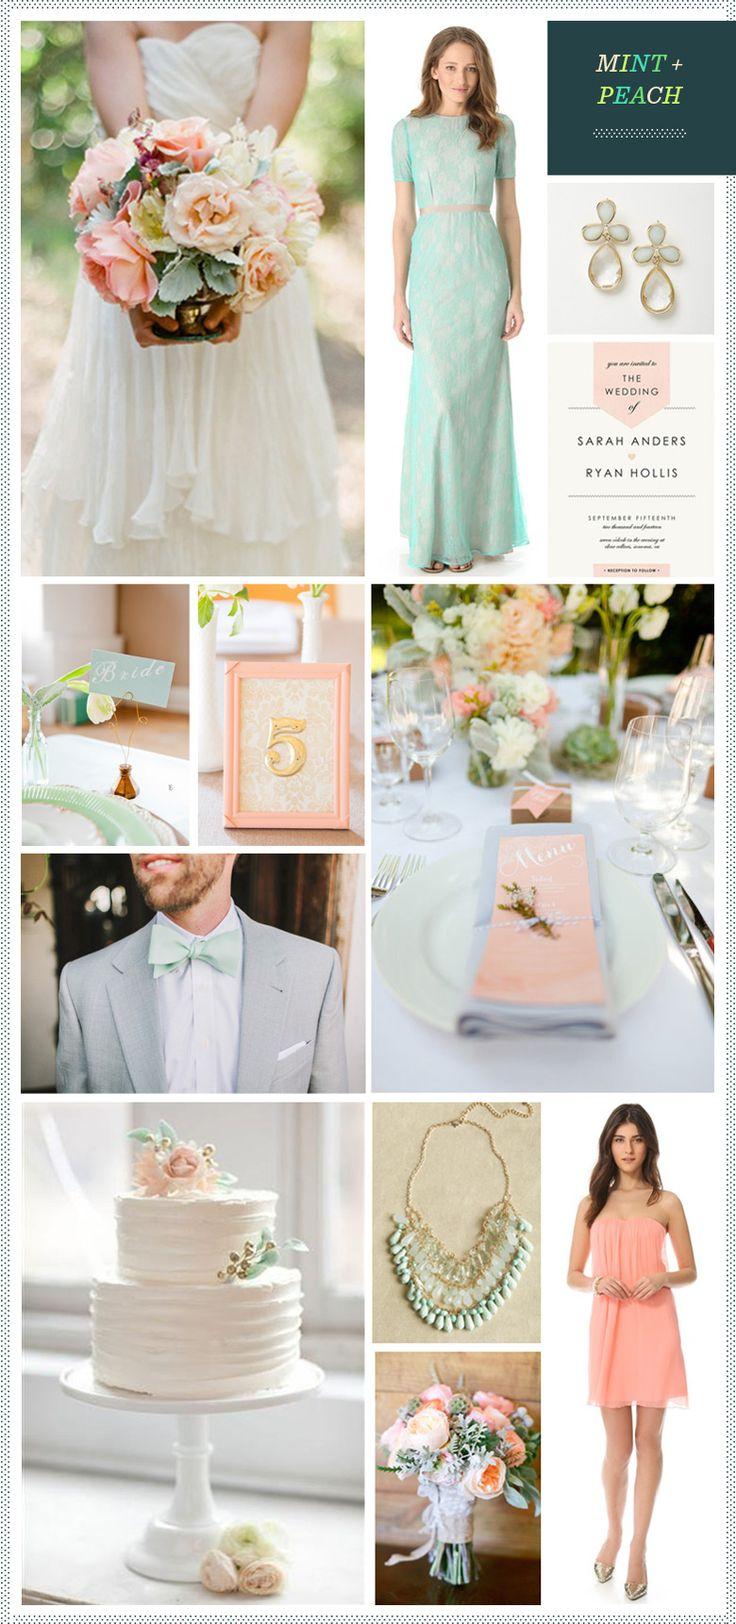 Mint + Peach Wedding Inspiration